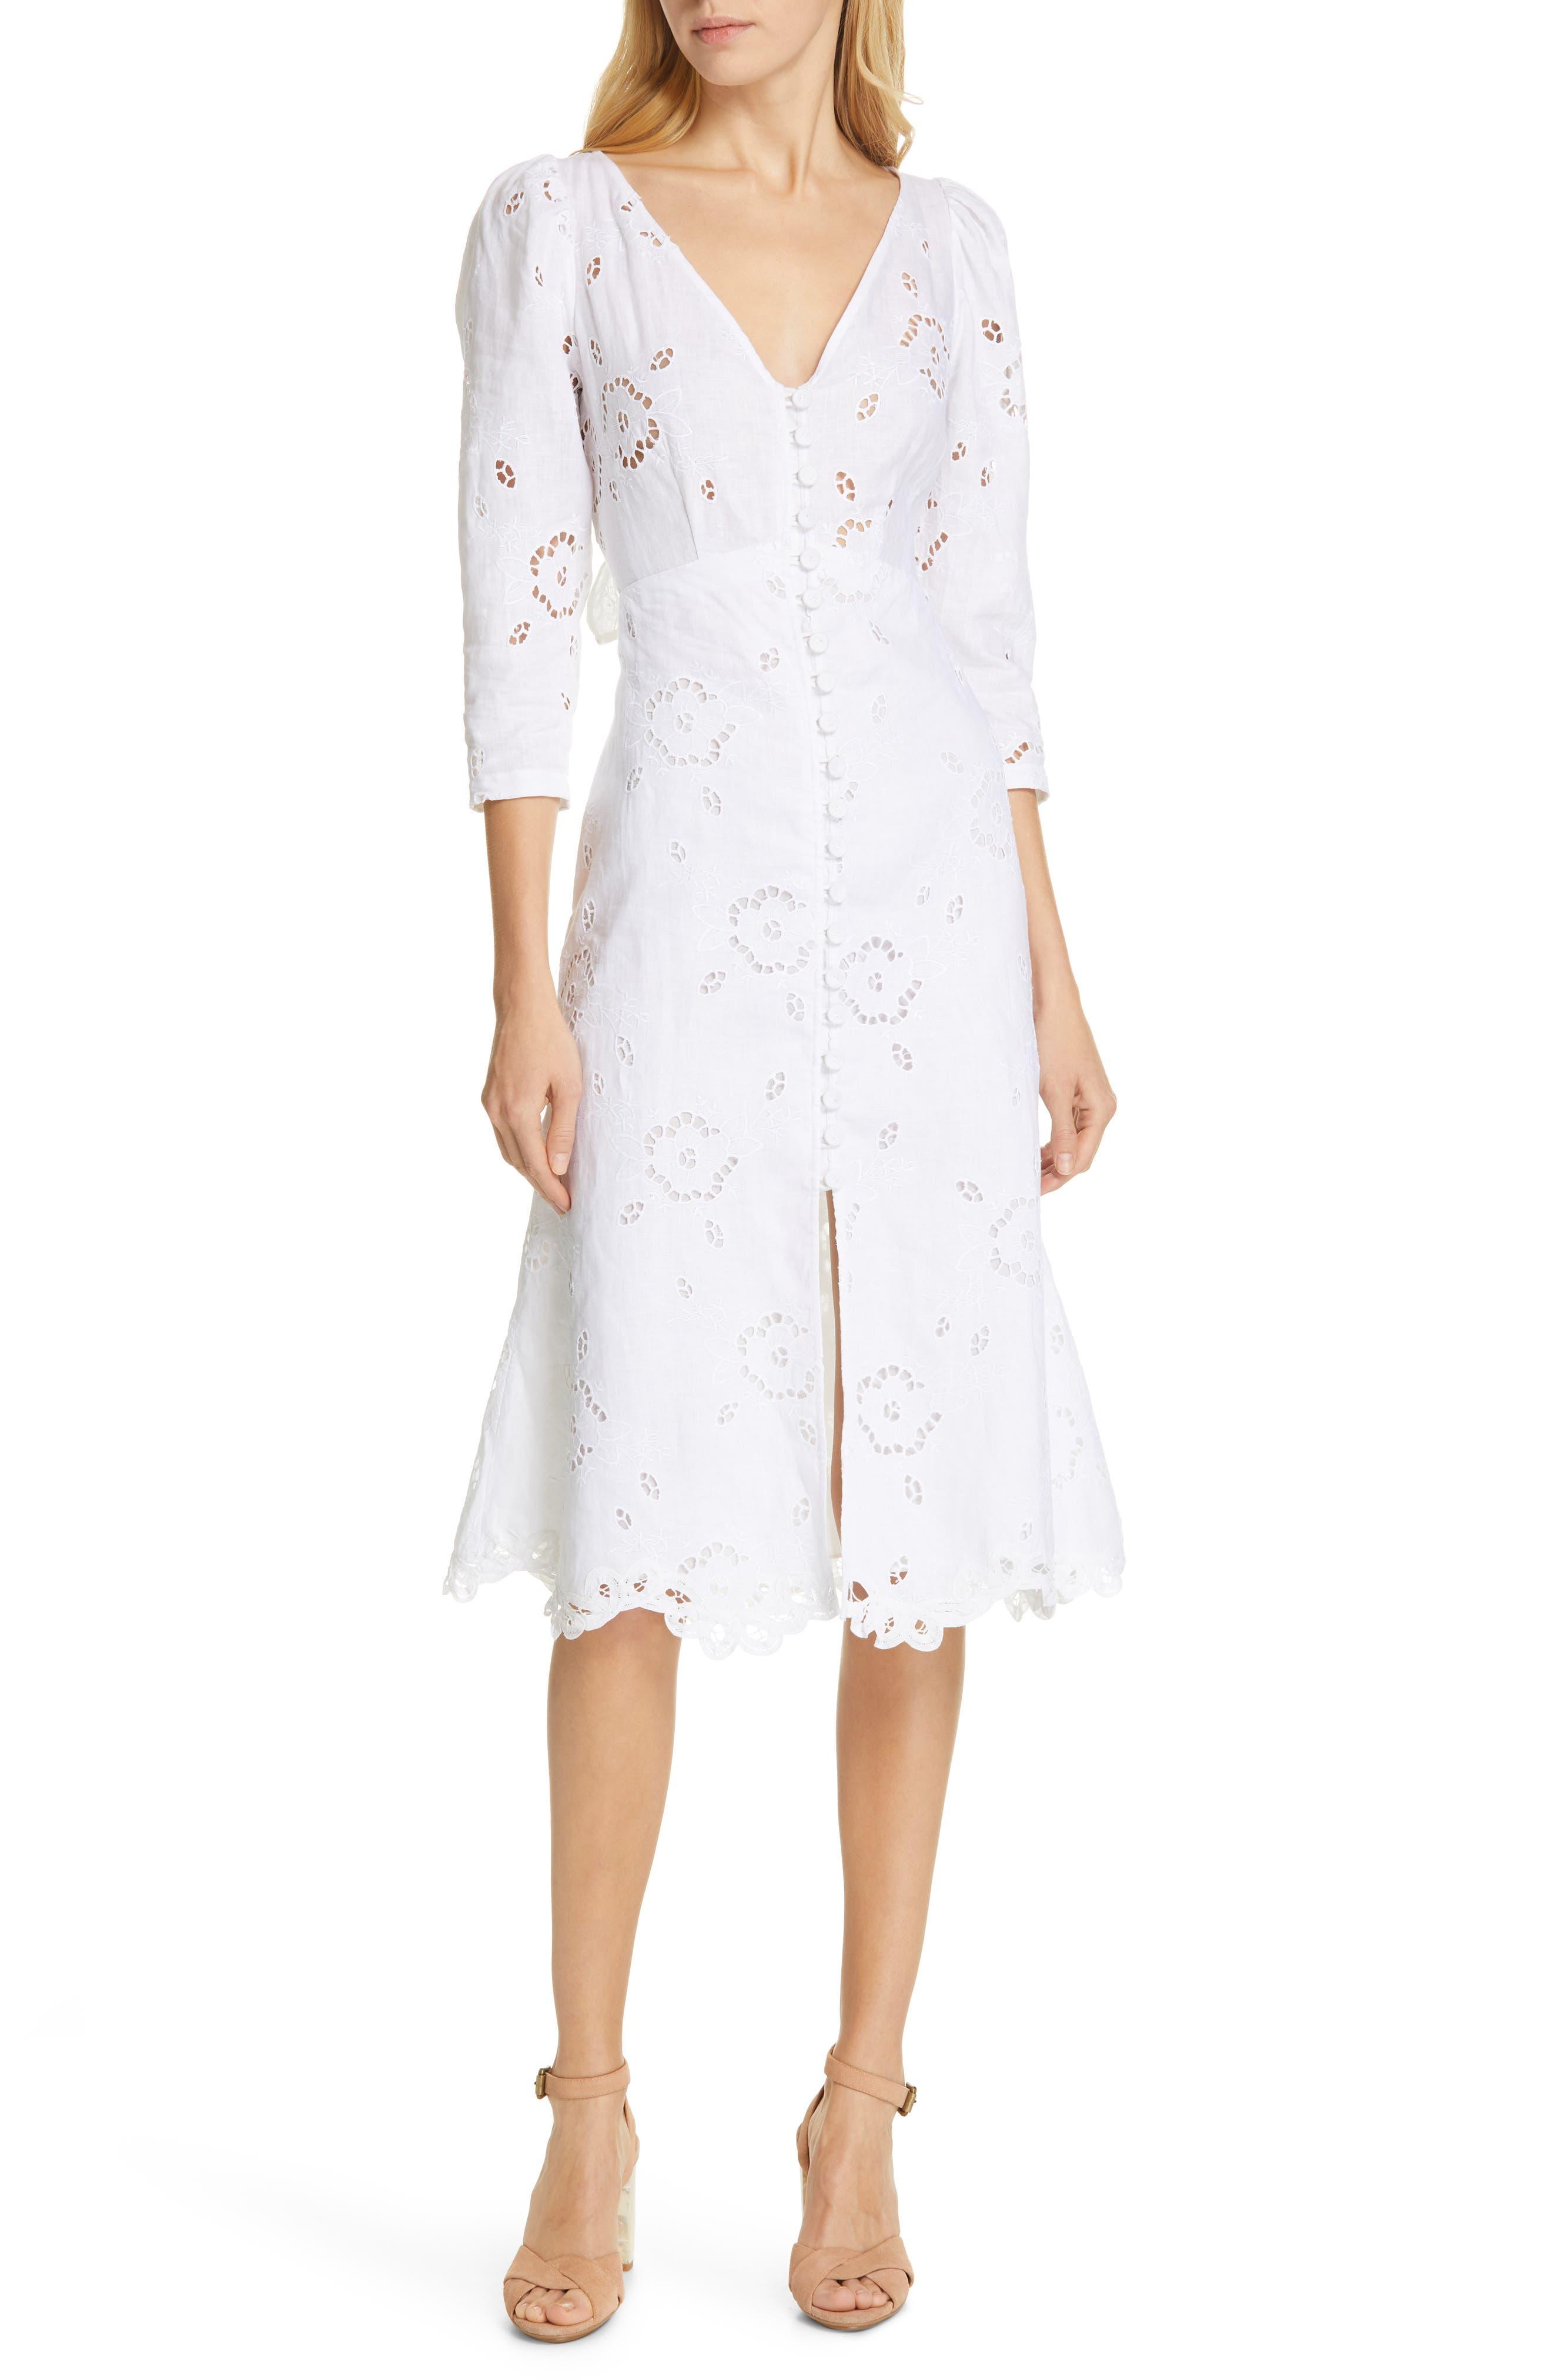 REBECCA TAYLOR, Terri Embroidered A-Line Dress, Main thumbnail 1, color, MILK